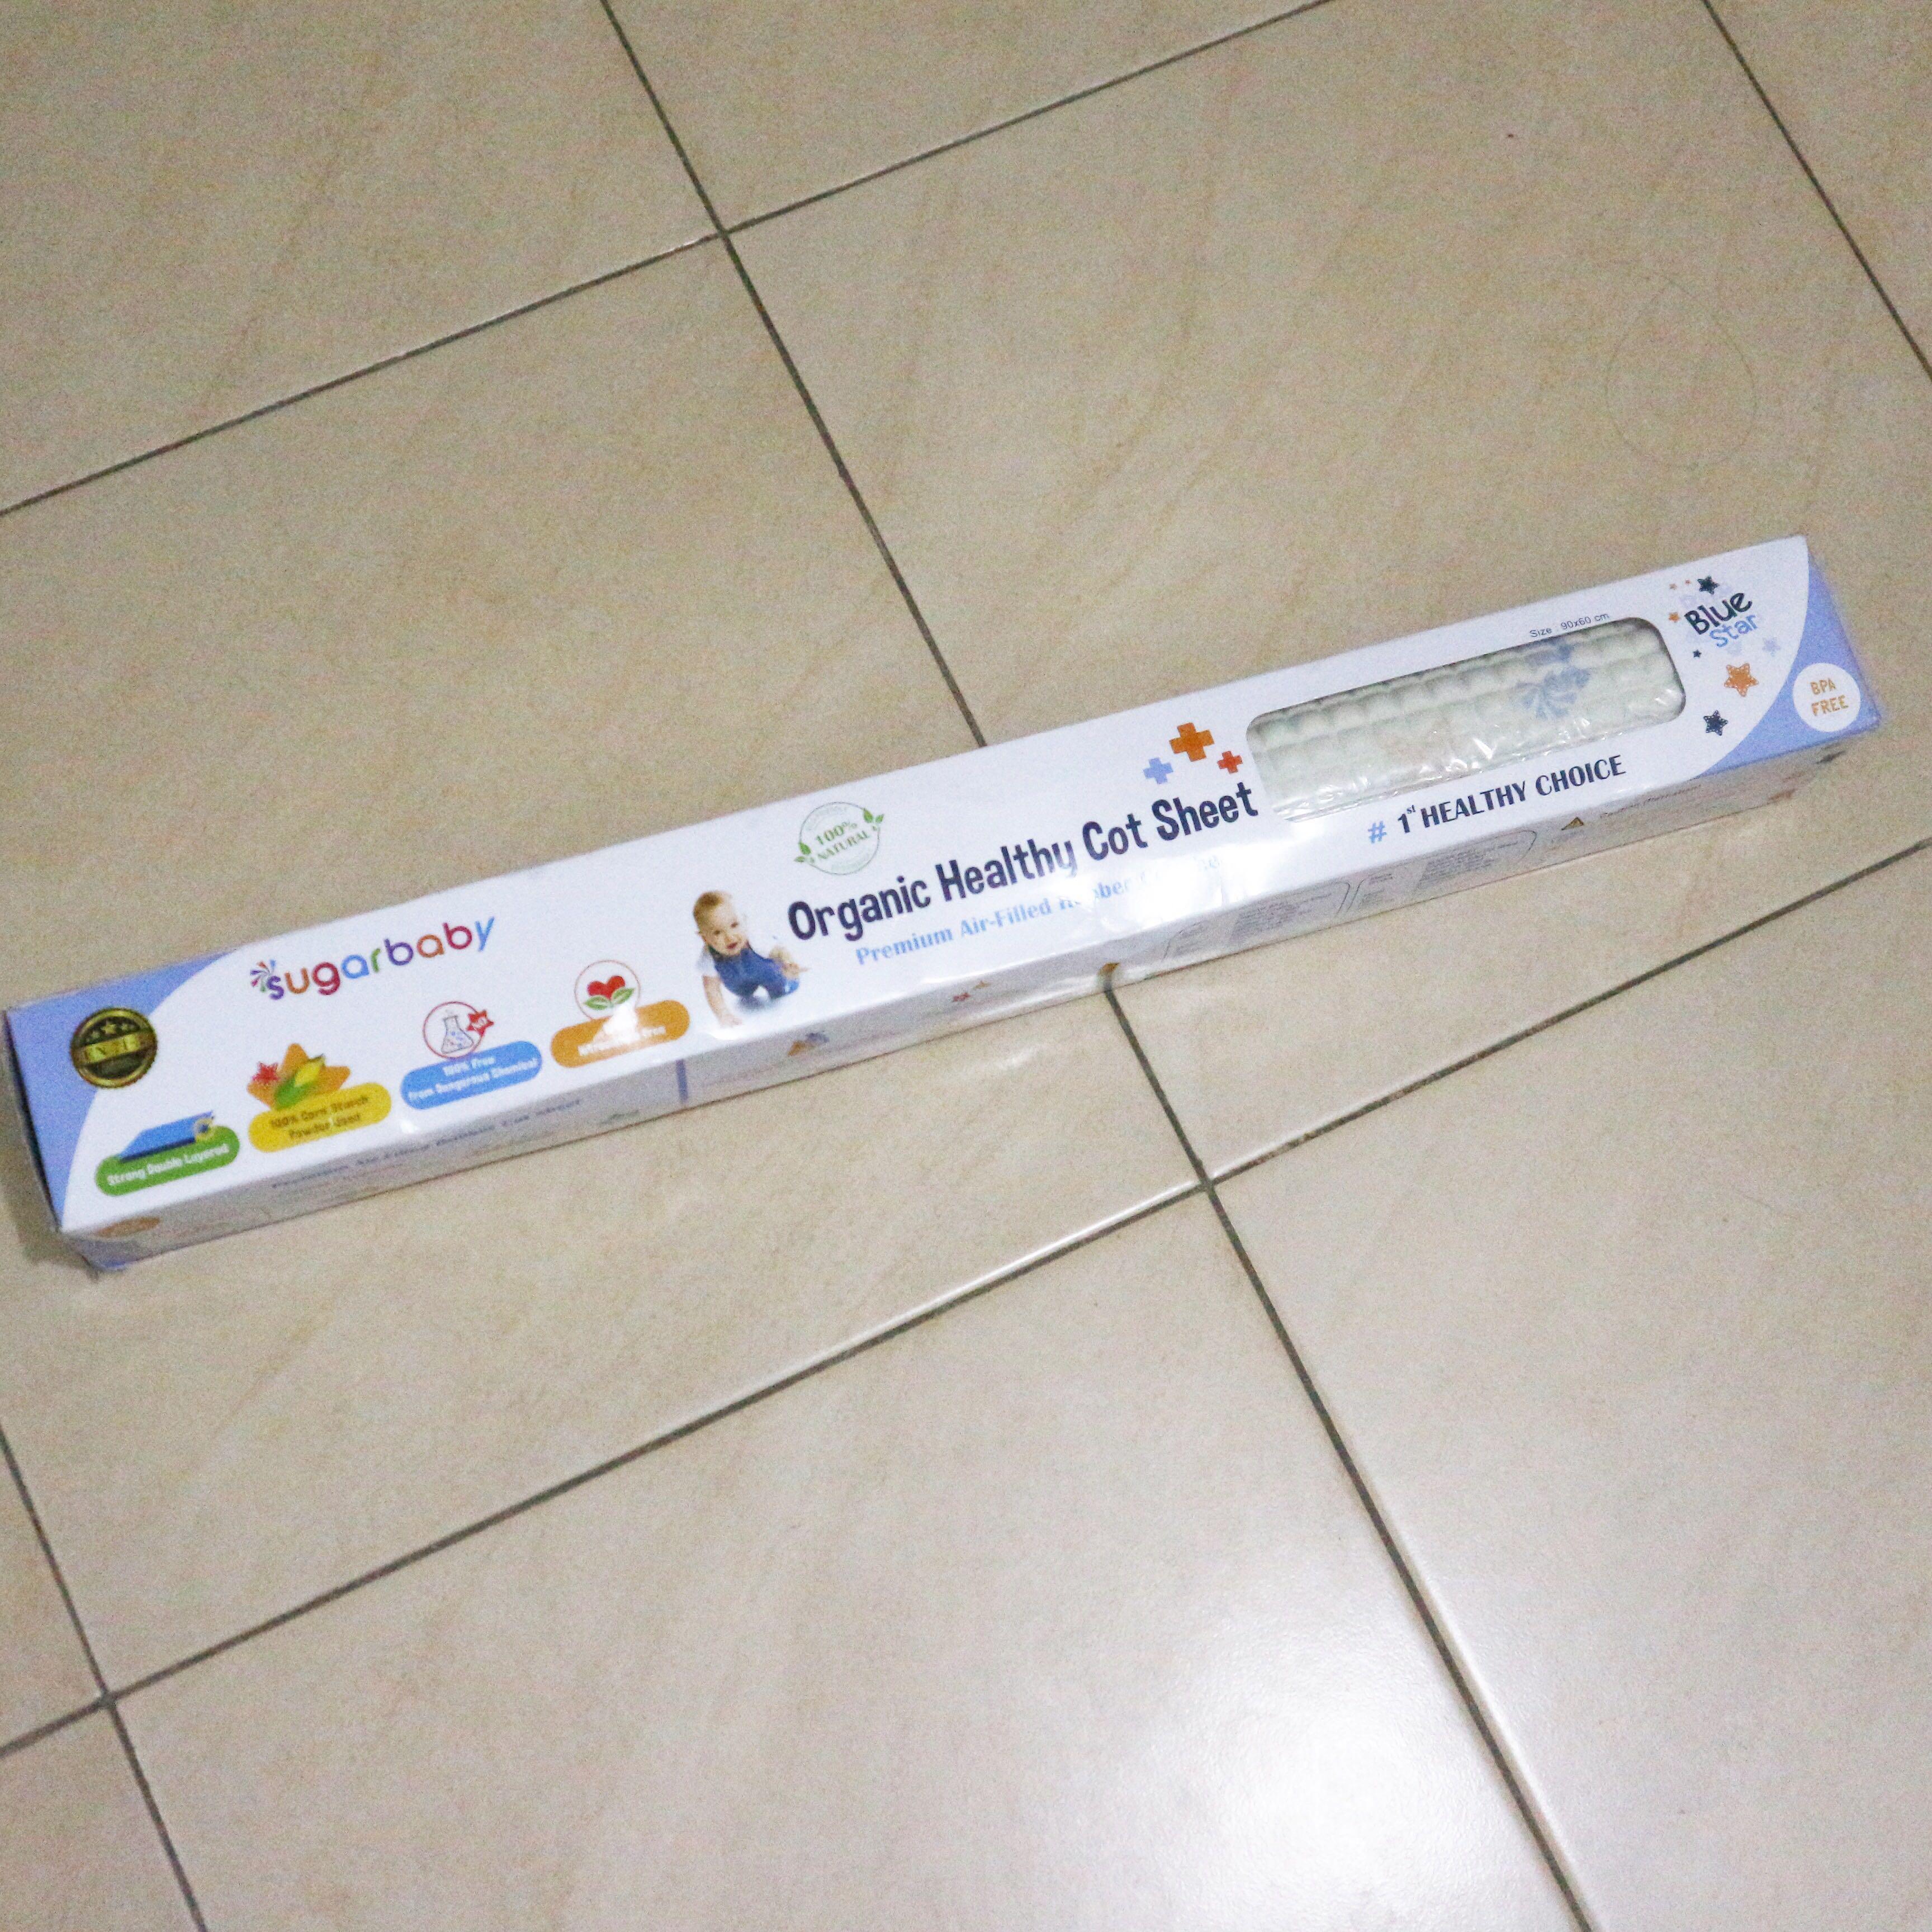 Perlak Khusus Bayi Much Sugar Baby Organik Daftar Organic Healthy Premium Air Filled Rubber Cot Sheet Blue Star